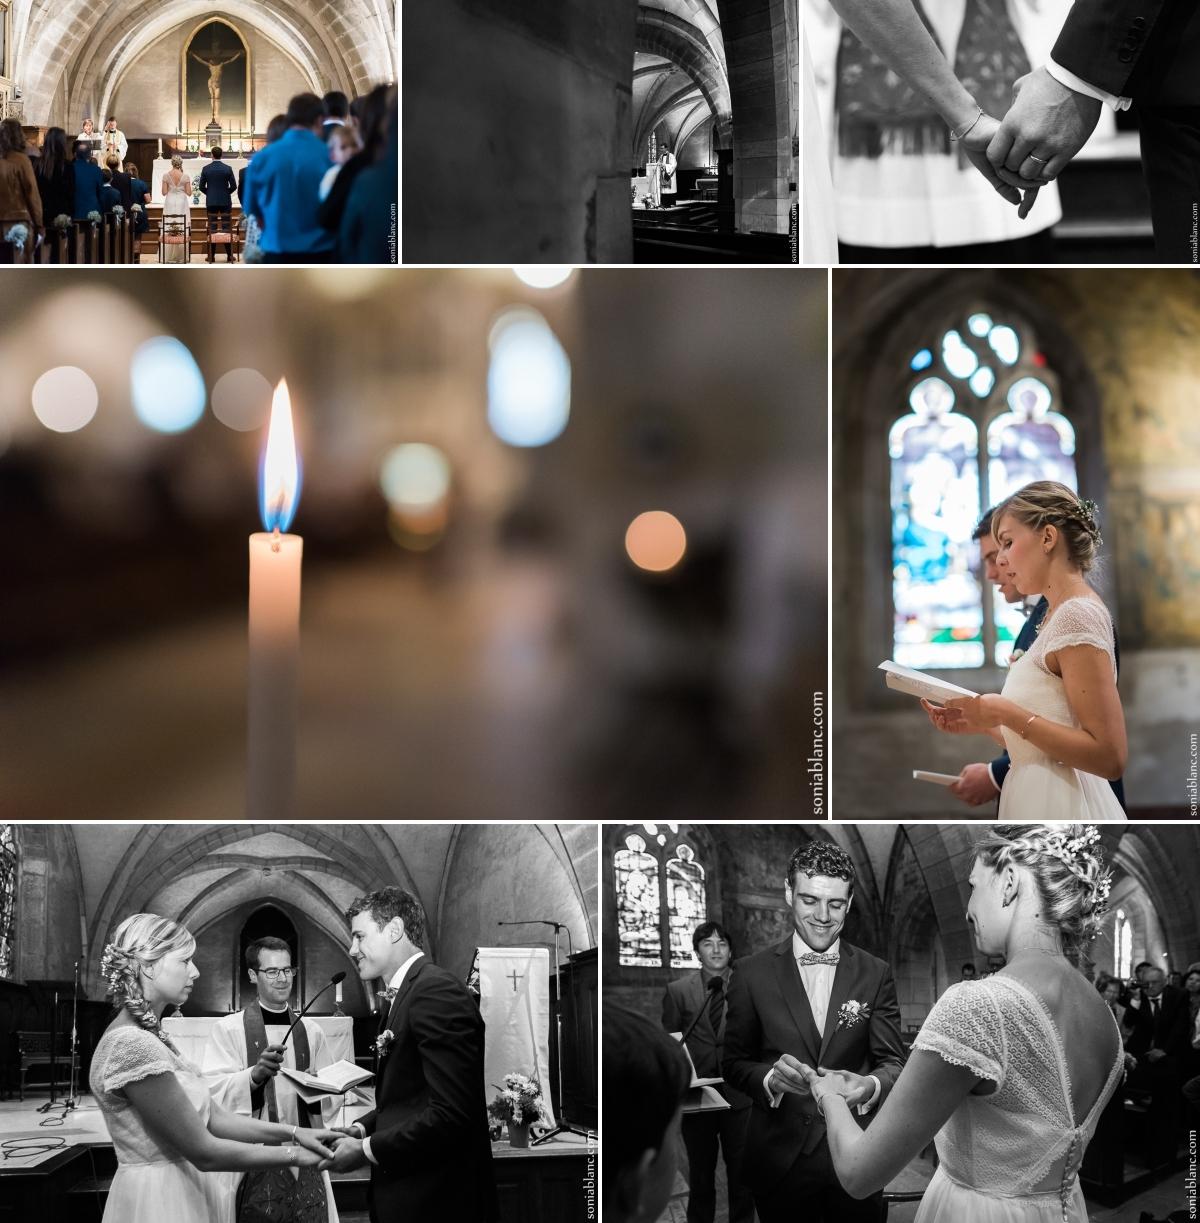 5. reportage photo de mariage à dijon - cérémonie religieuse - bourgogne